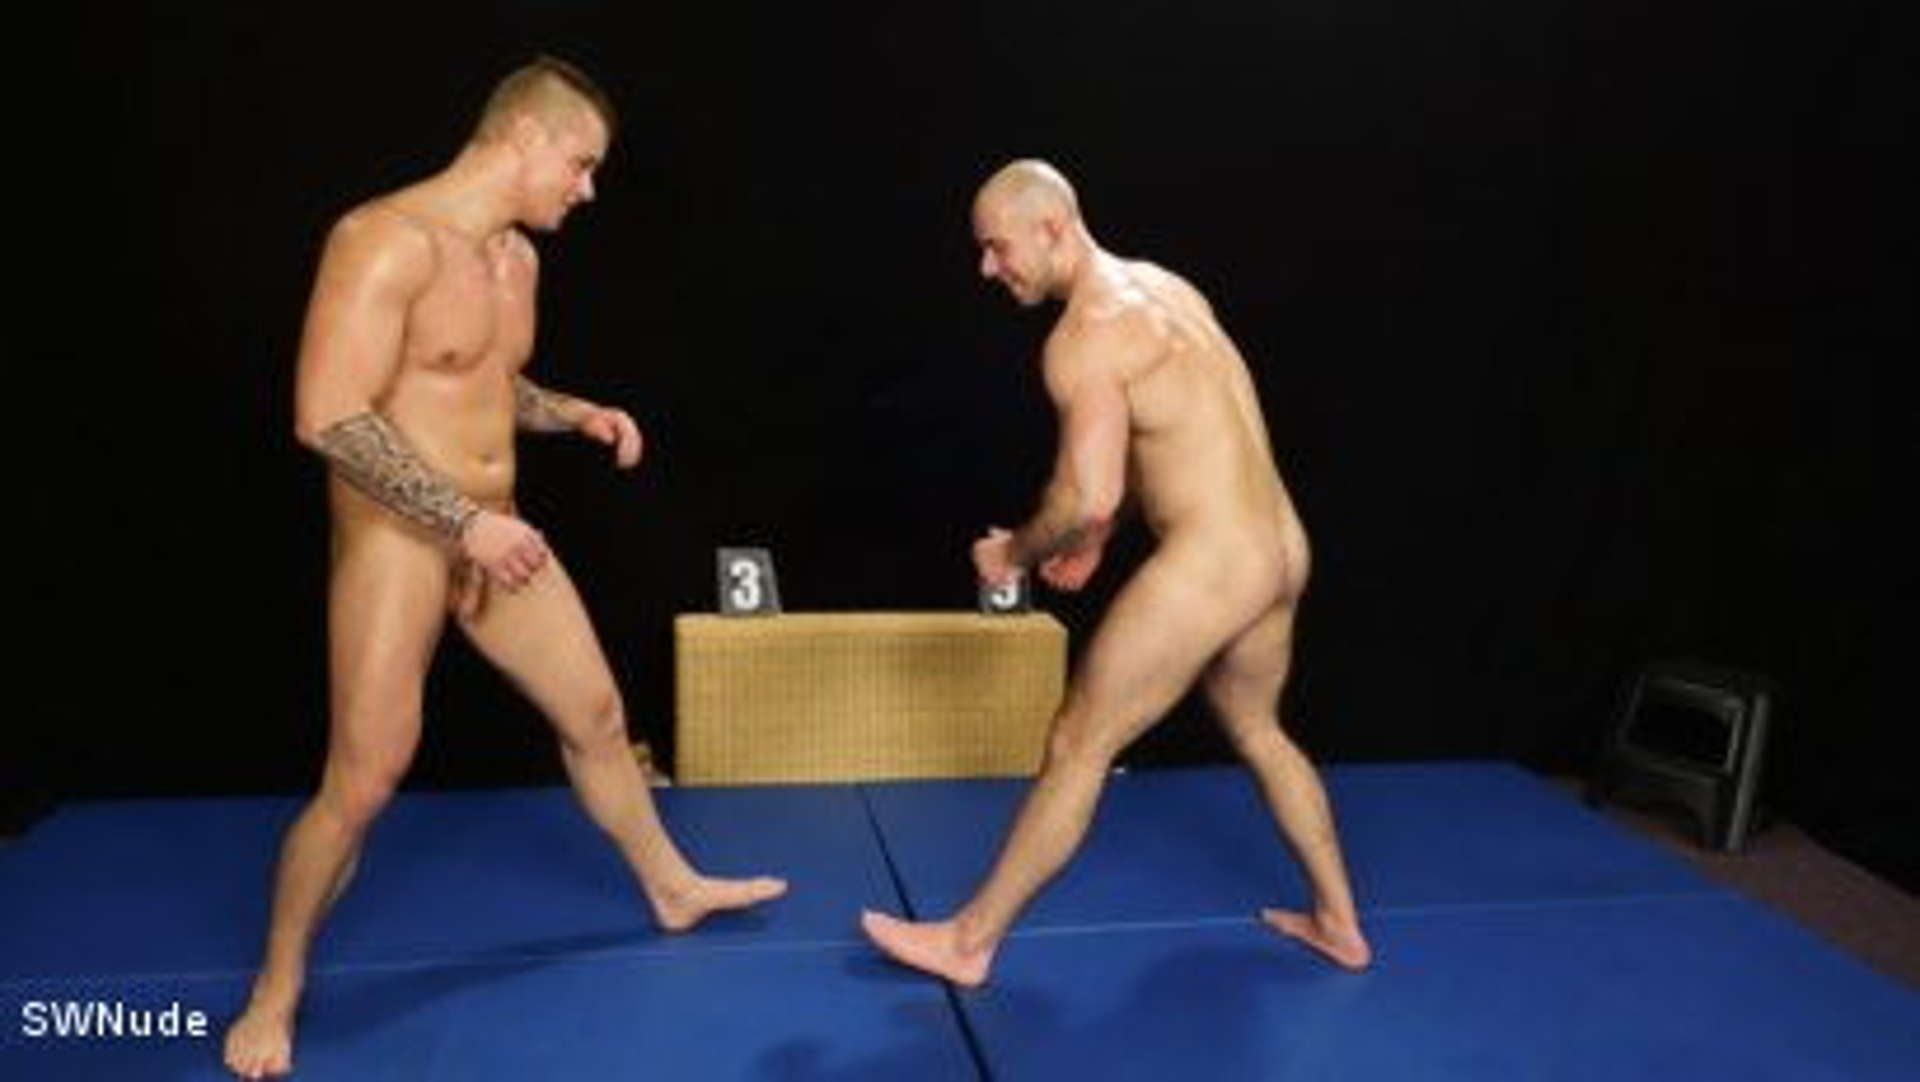 Photo number 5 from Jindra vs Marek - WRESTLING shot for swnude on Kink.com. Featuring Jindra Durak and Marek Borek in hardcore BDSM & Fetish porn.